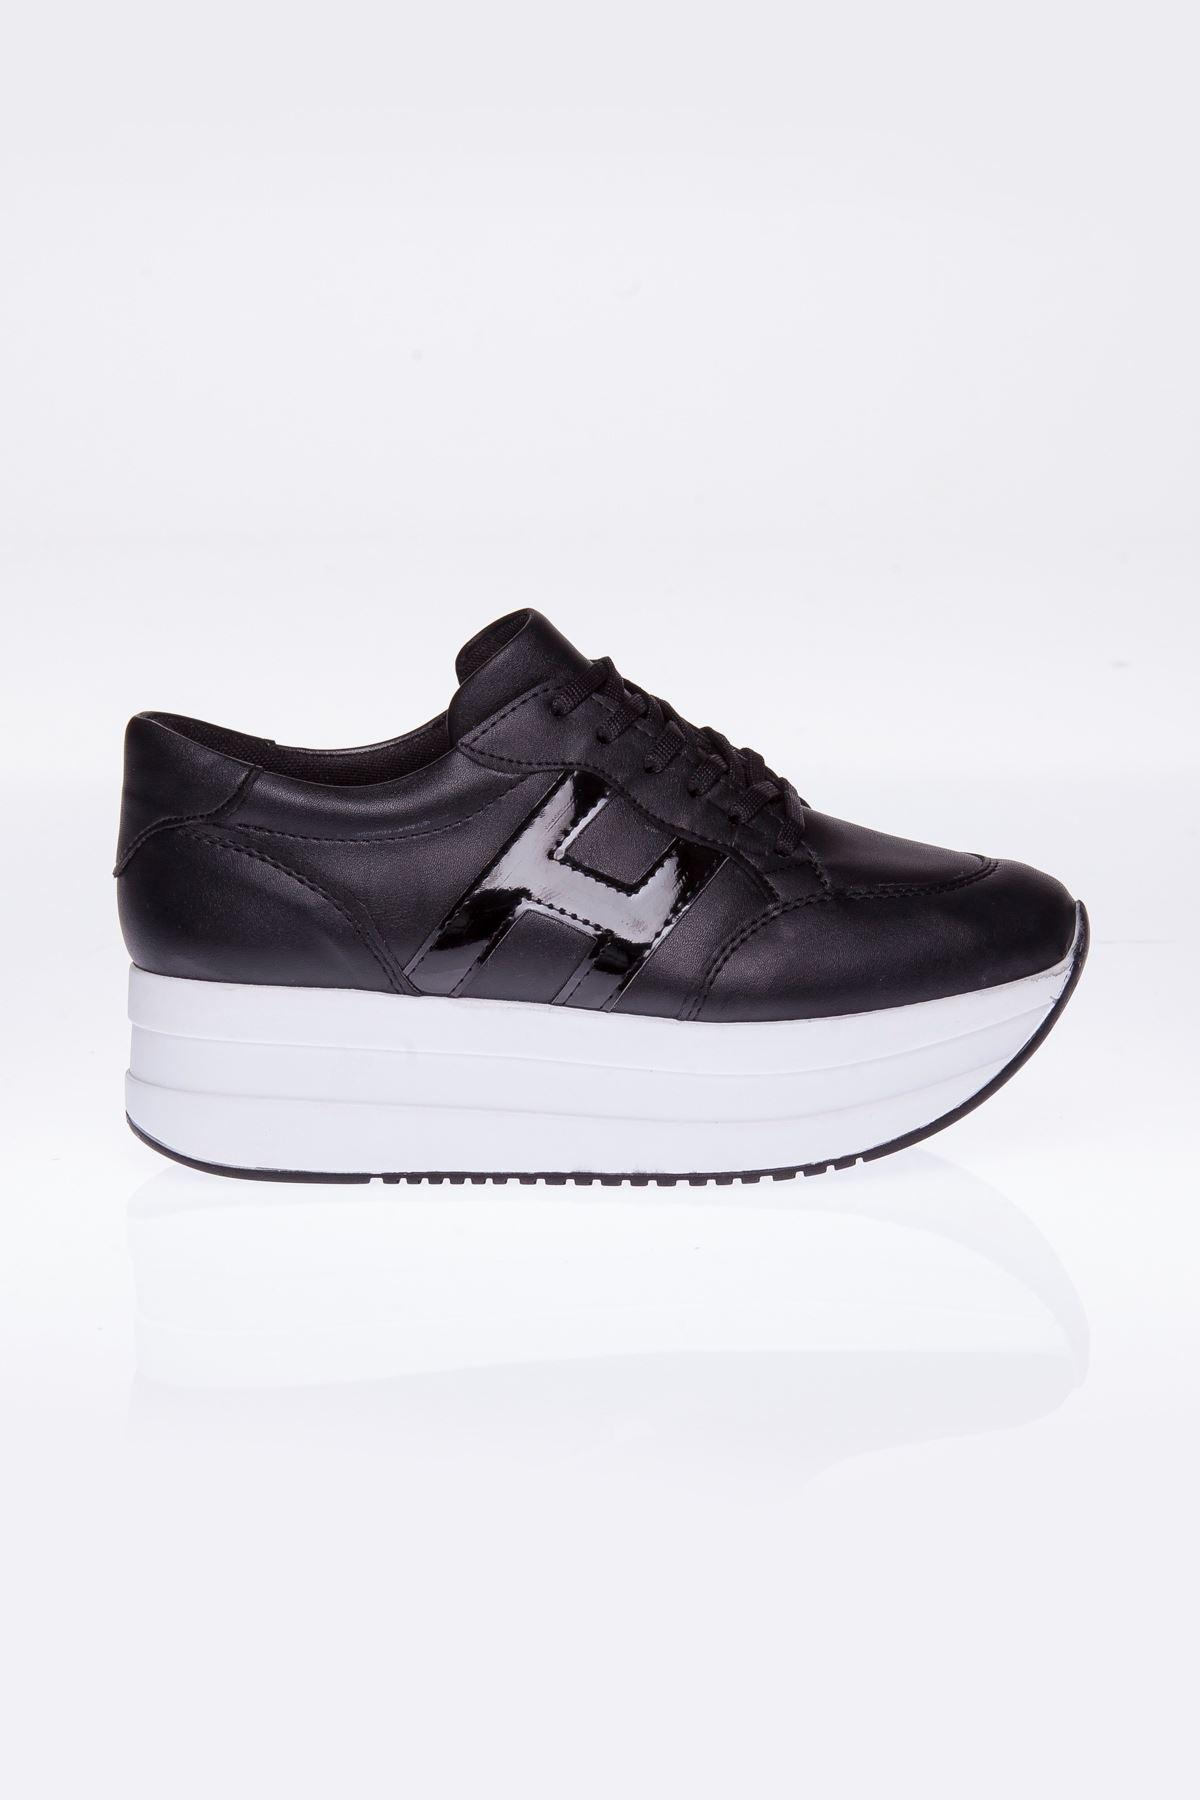 Oneo Ortapedik Yüksek Platform Siyah Bayan Spor Ayakkabı